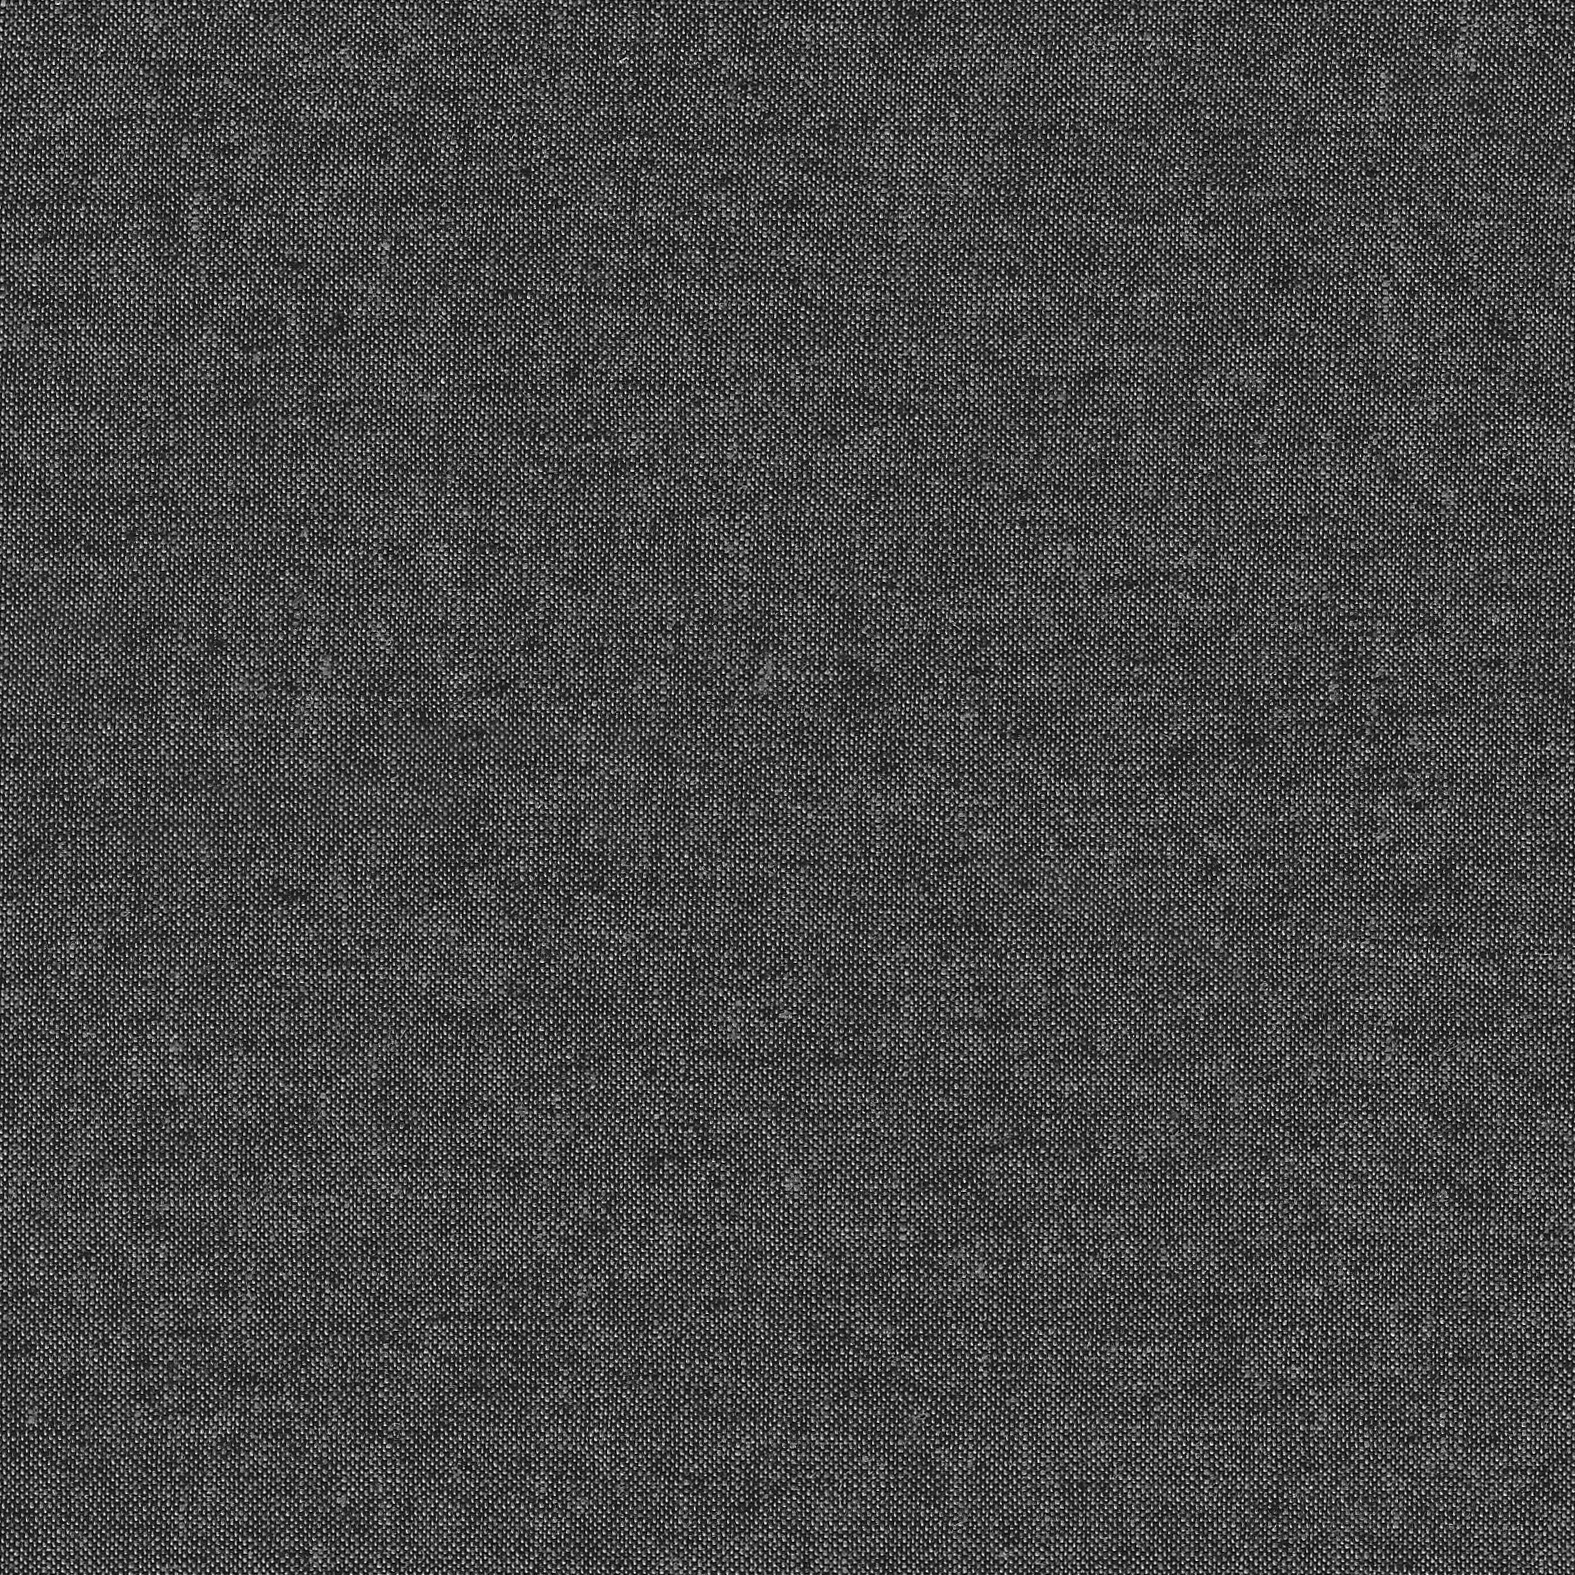 Robert Kaufman : Essex Yarn Dyed : Charcoal : 1/2 metre